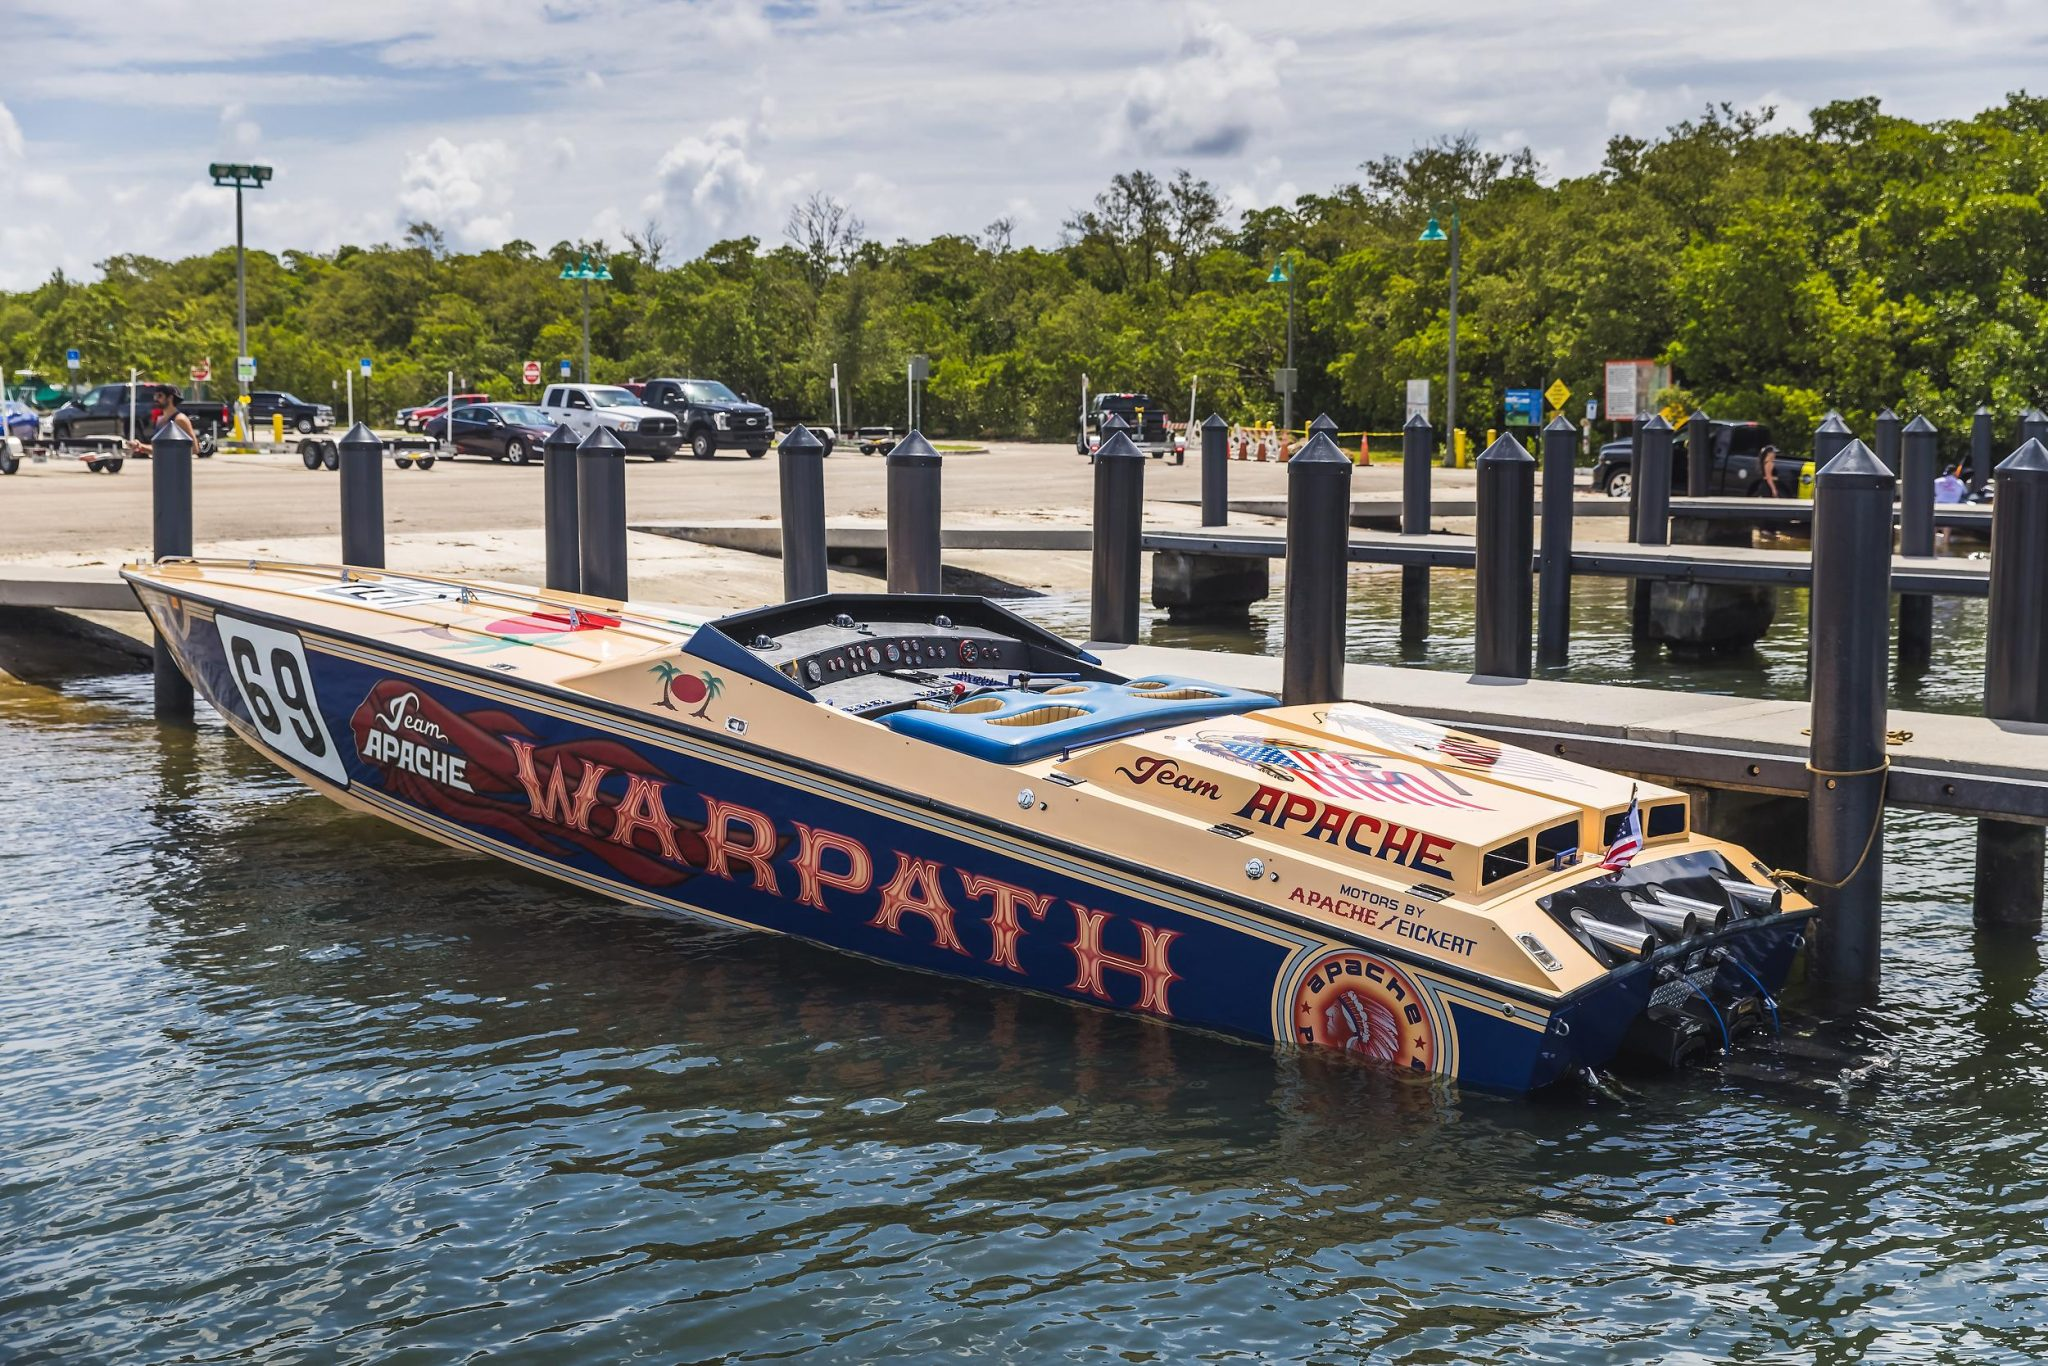 1984 Apache Offshore Powerboat Warpath rear three-quarter